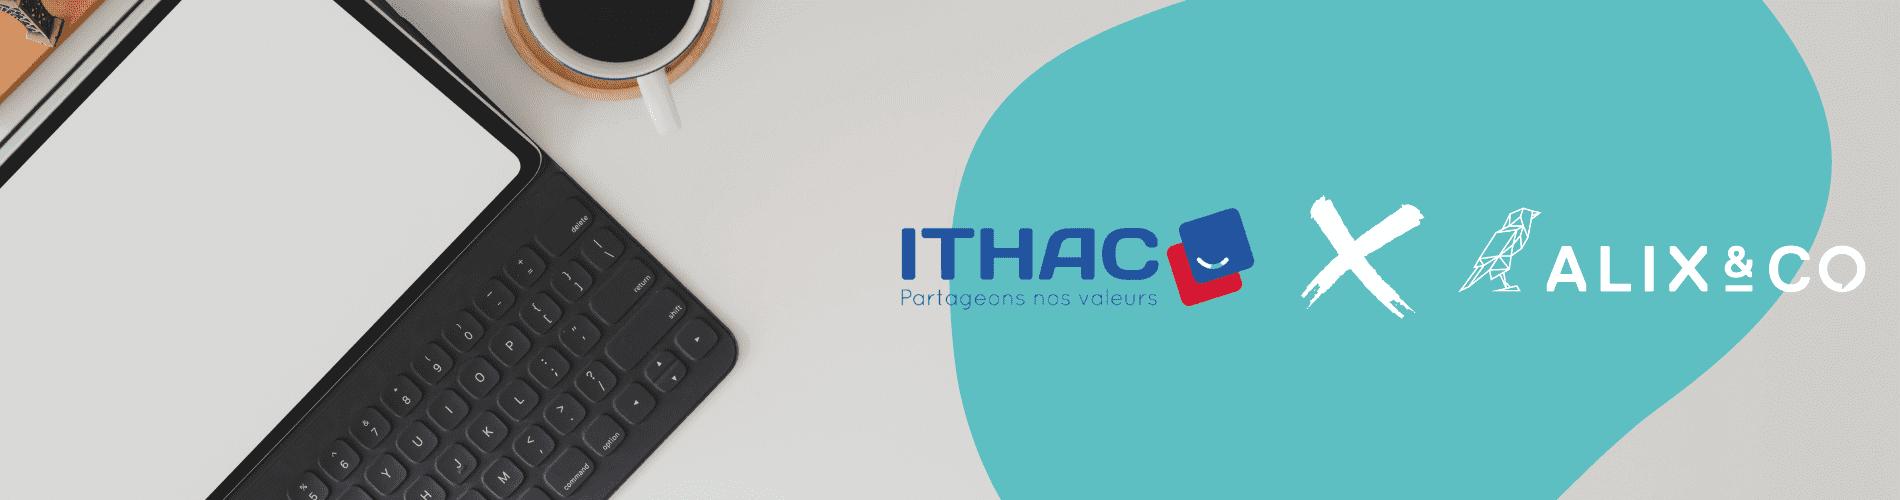 Ithac x Alix&Co